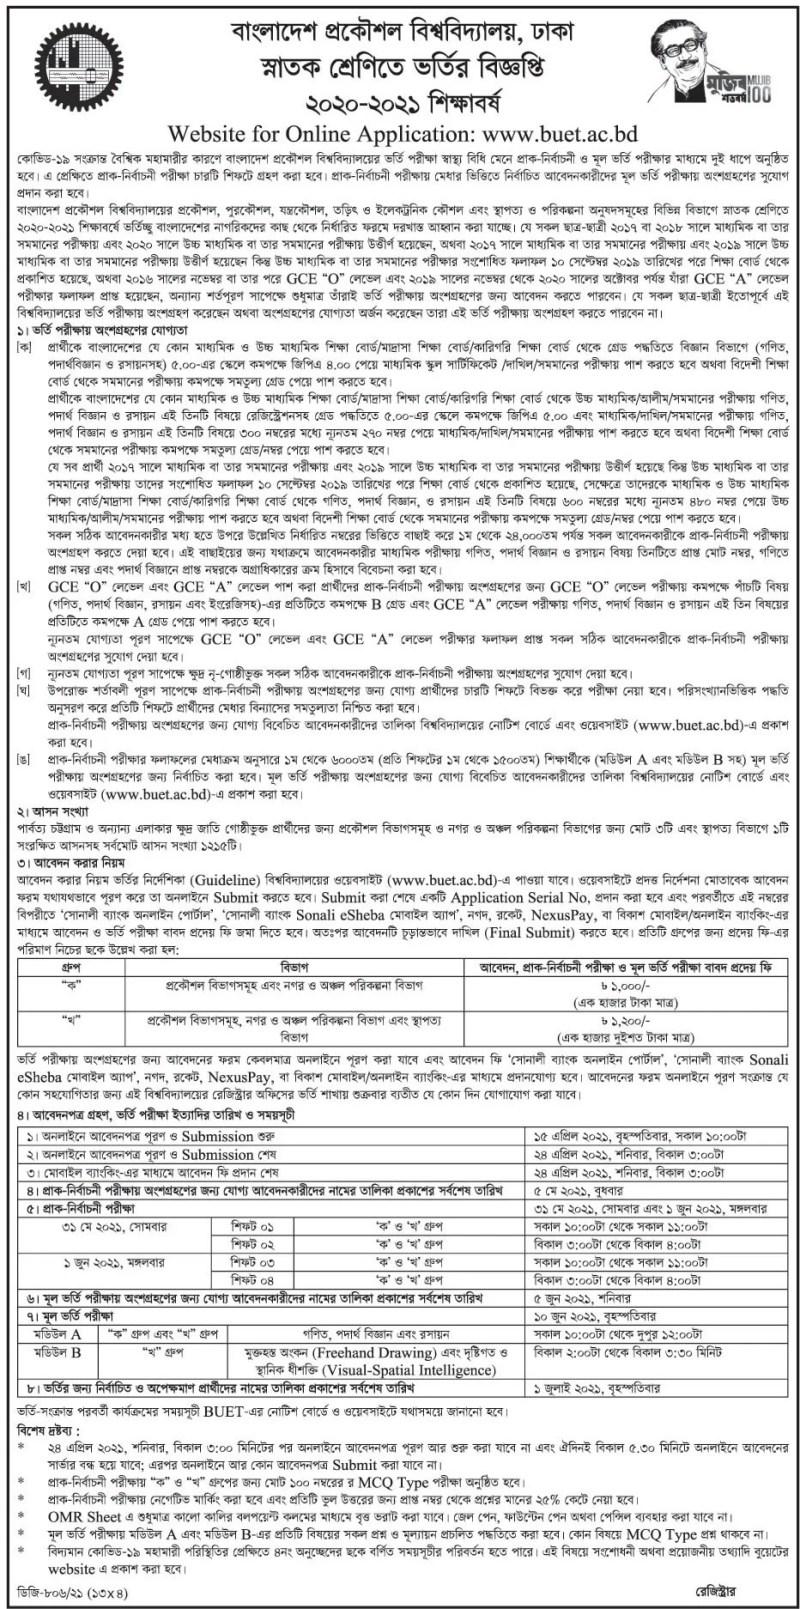 Bangladesh University of Engineering and Technology Admission Circular 2020-21